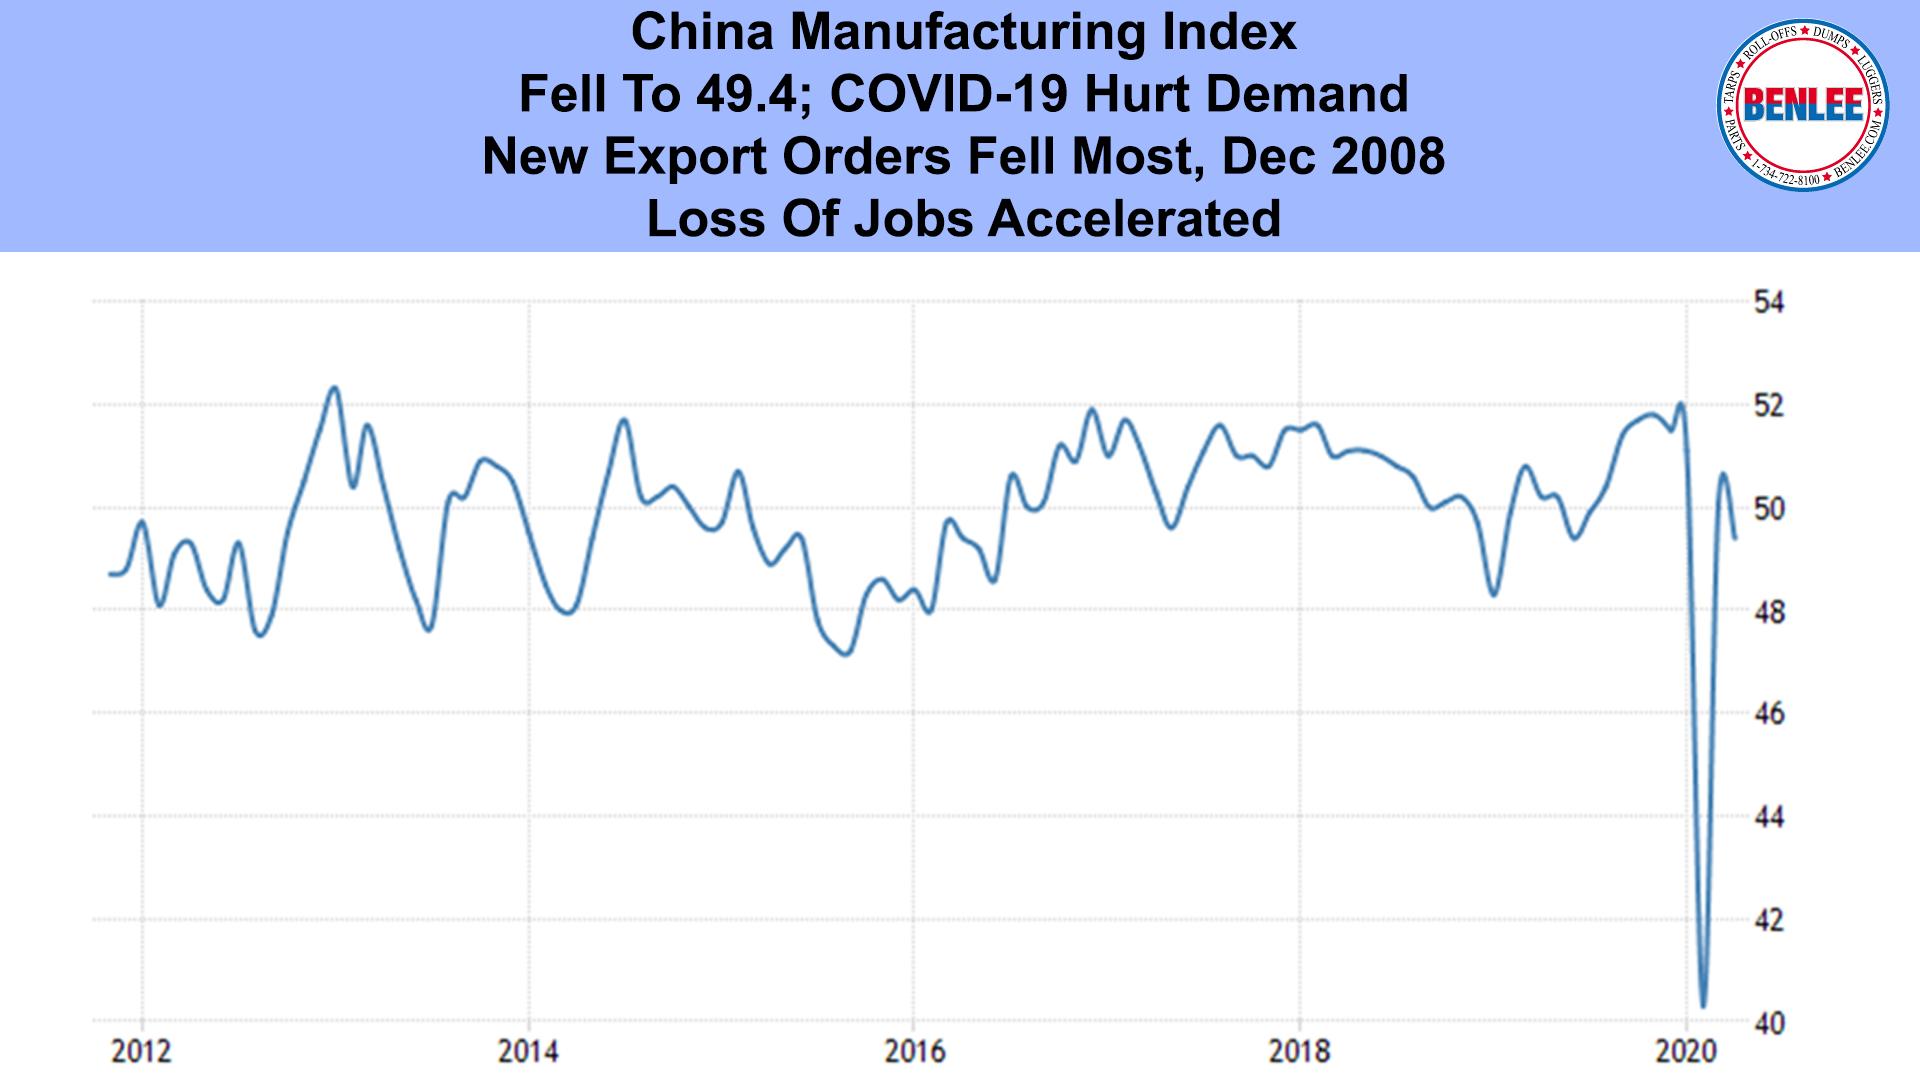 China Manufacturing Index